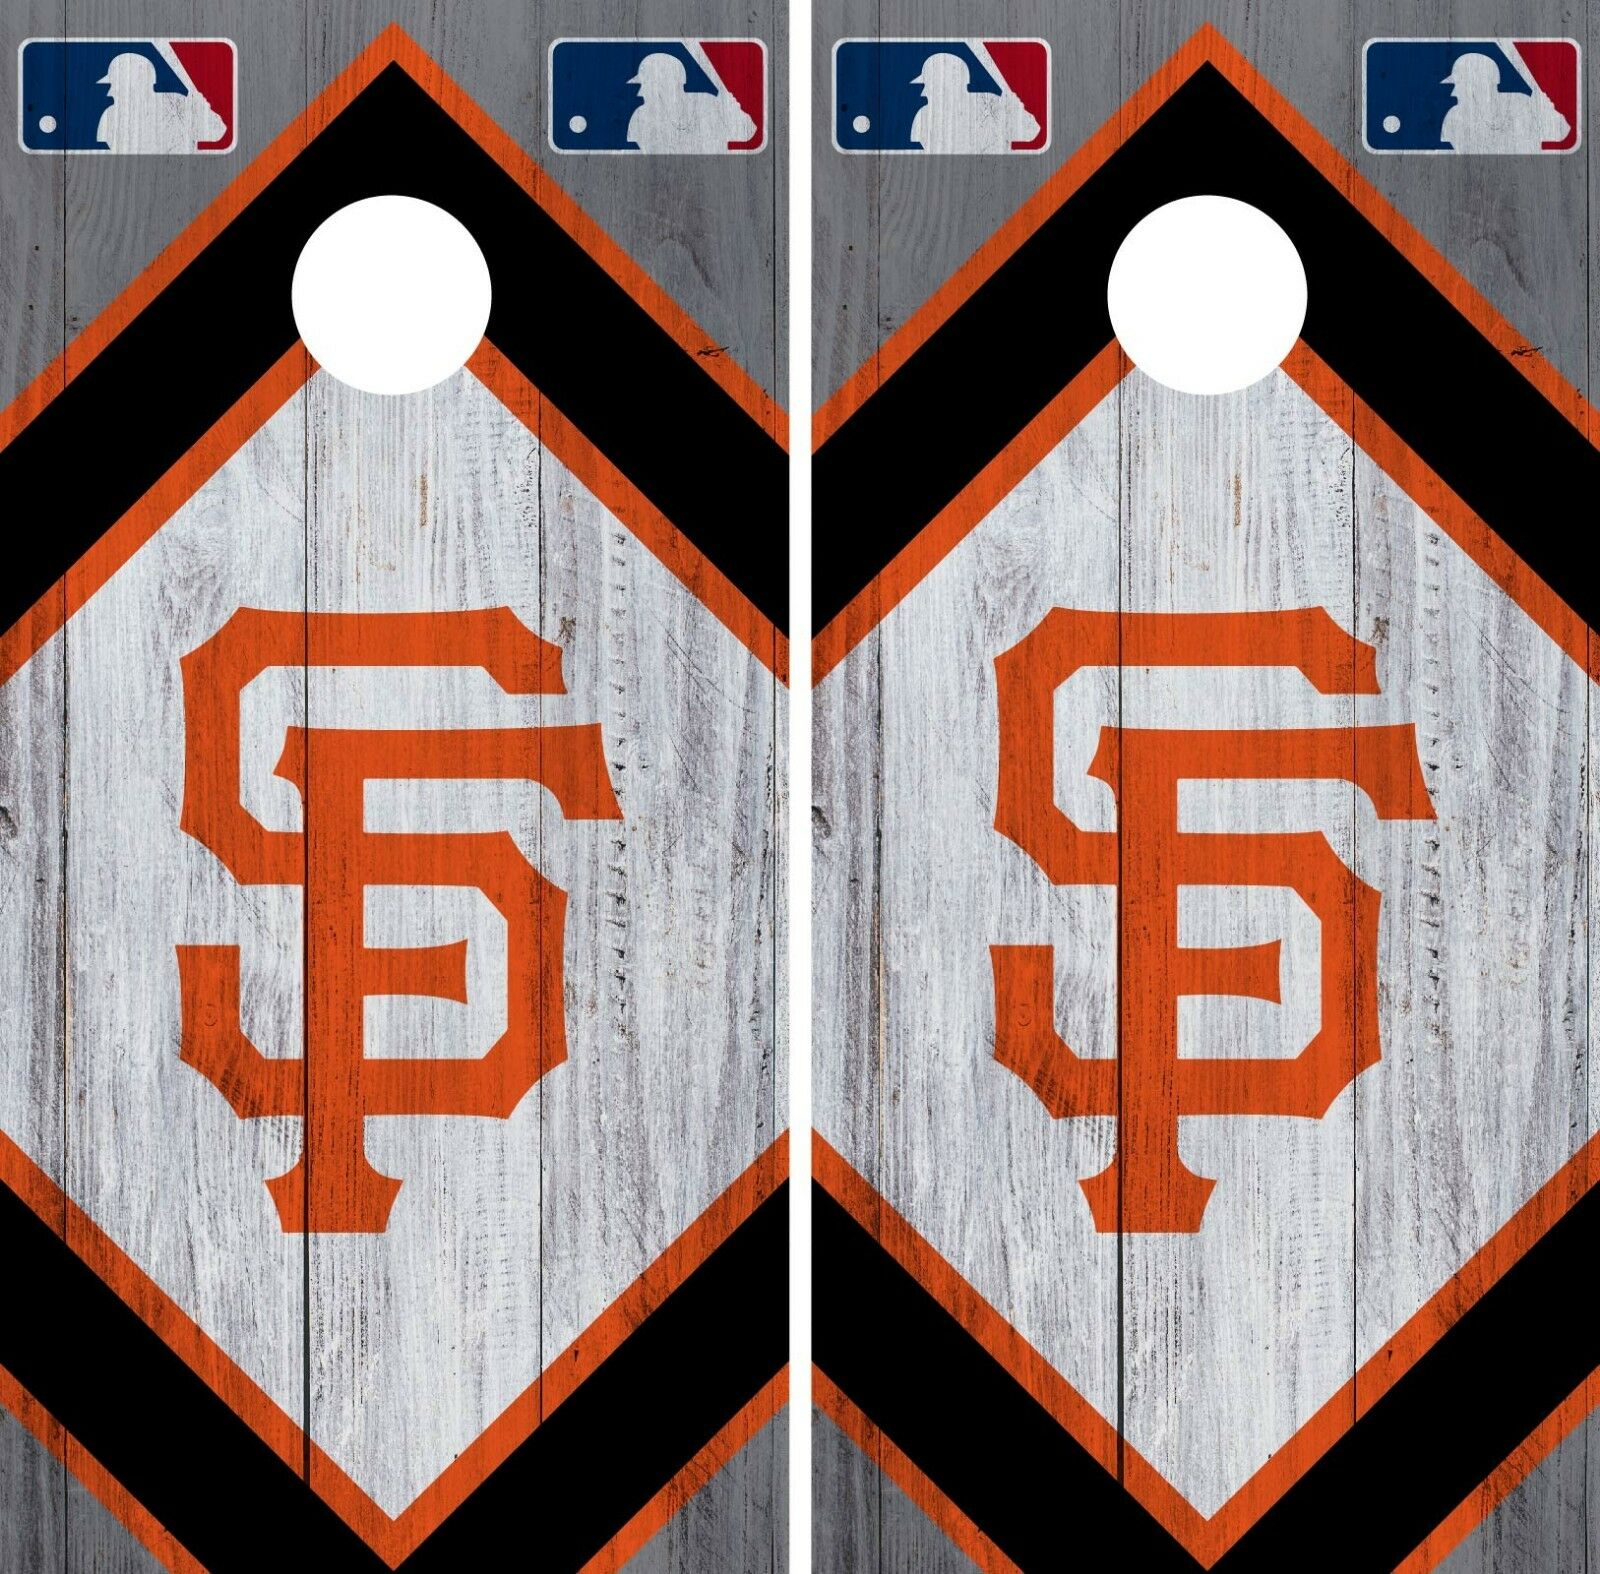 San Francisco Giant Cornhole Wrap MLB Wood Game Board Skin Set Vinyl Decal CO530